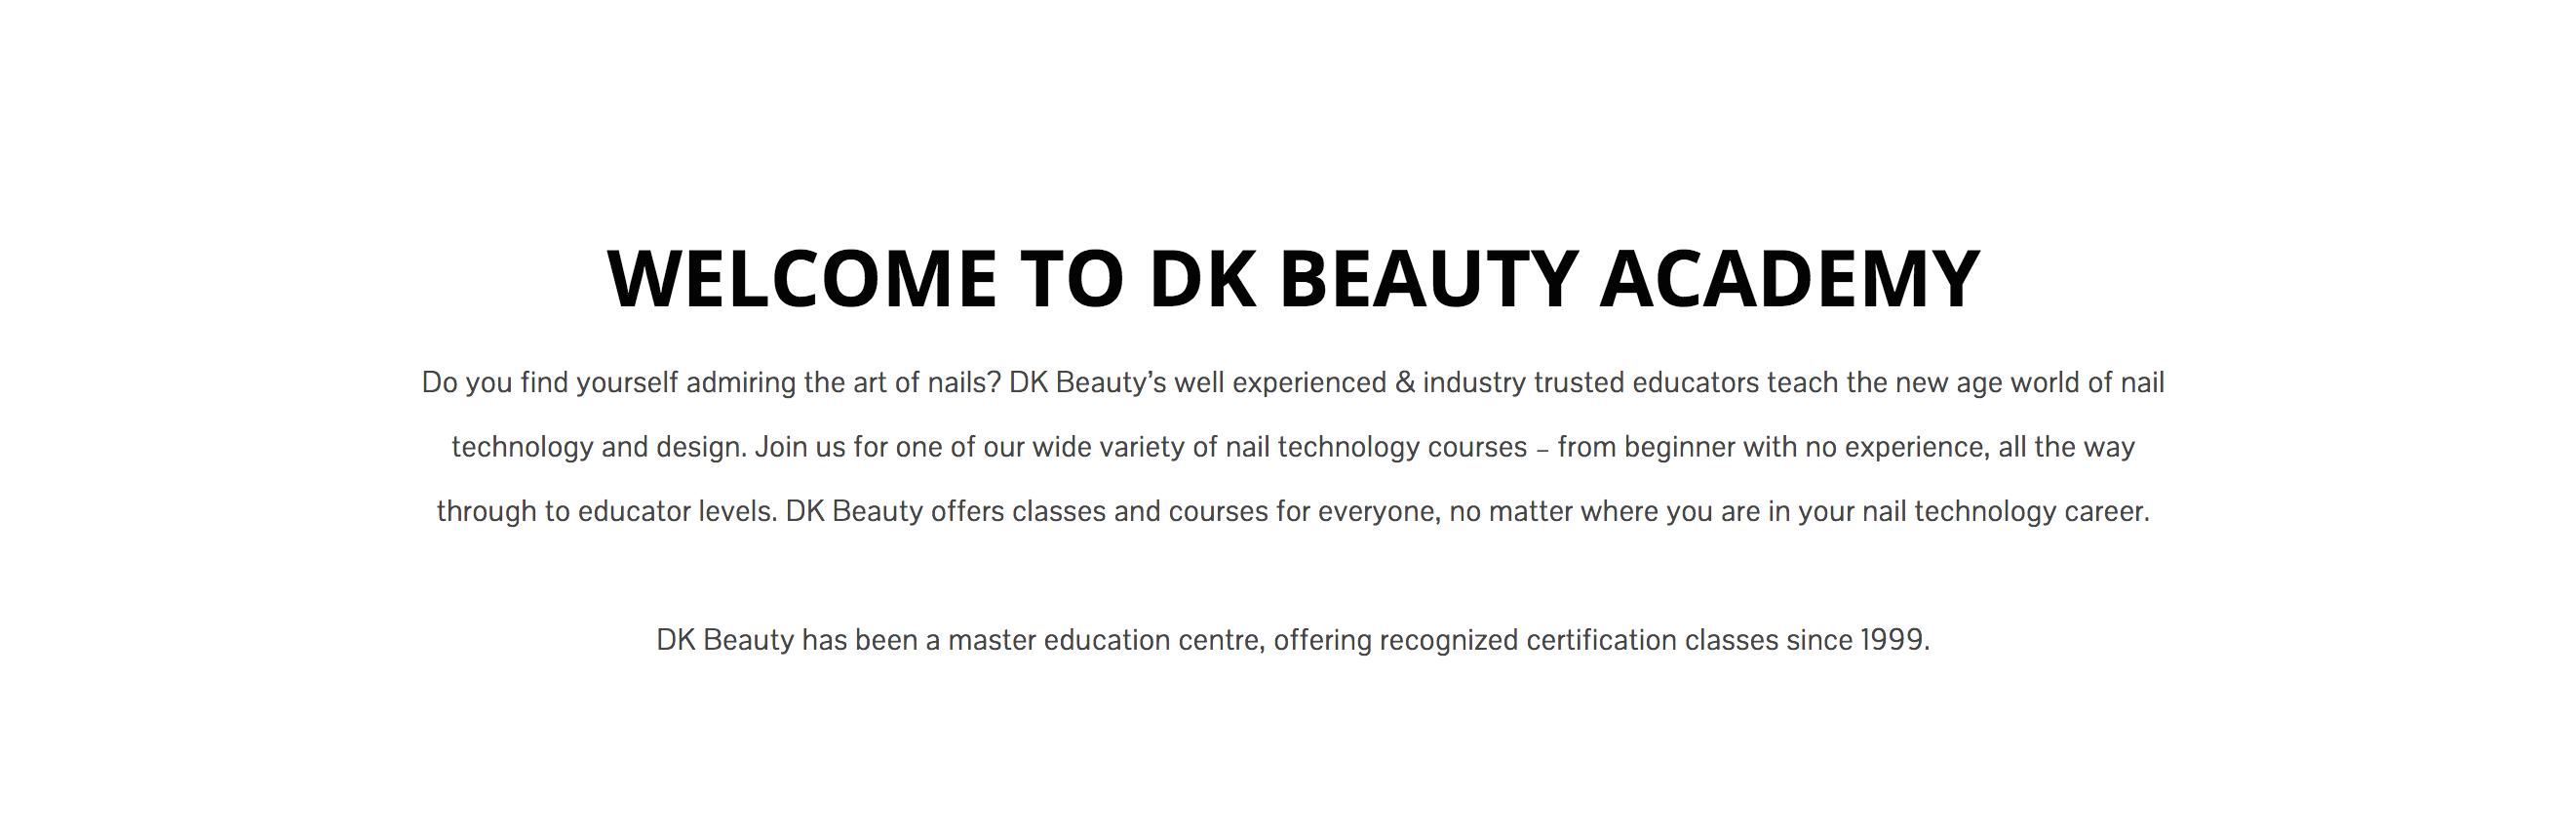 dkbeauty-nail-academy.png